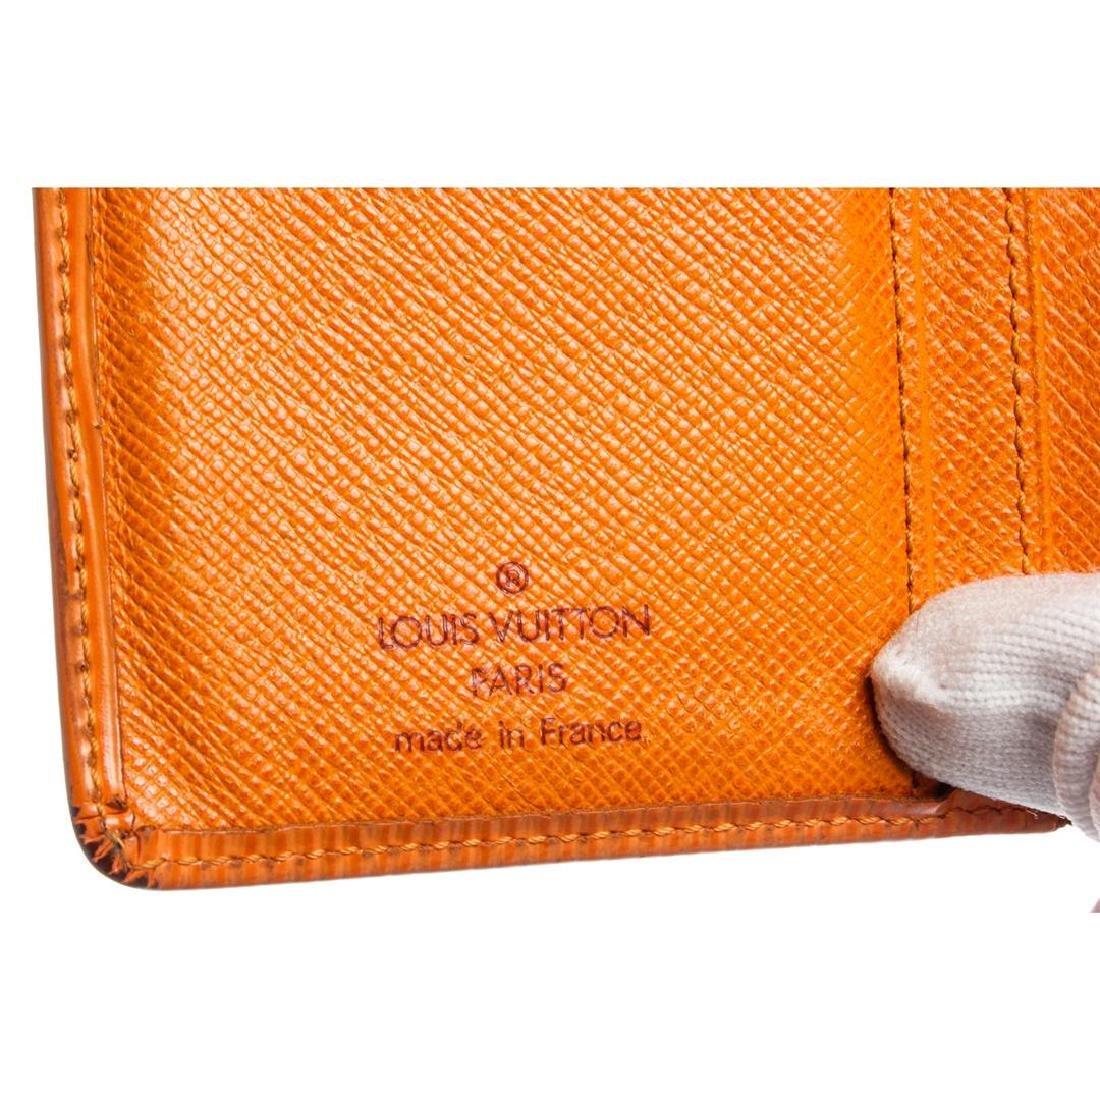 Louis Vuitton Orange Epi Leather French Purse Wallet - 6